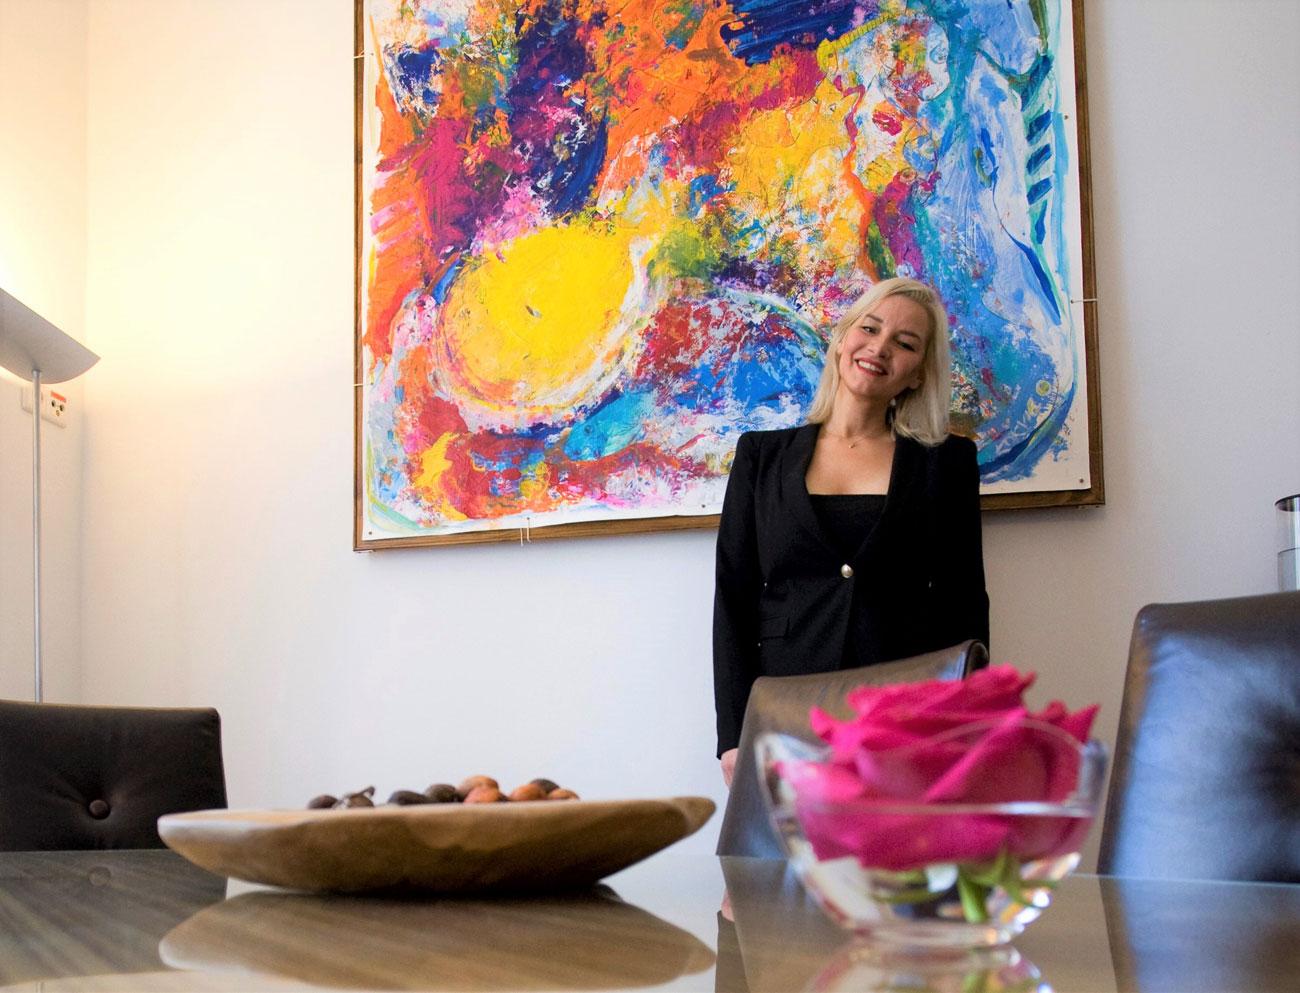 FALLING IN, object painting 21.55 x 1.55 Kim Okura, image courtesy of VCA Vienna City Apartments™